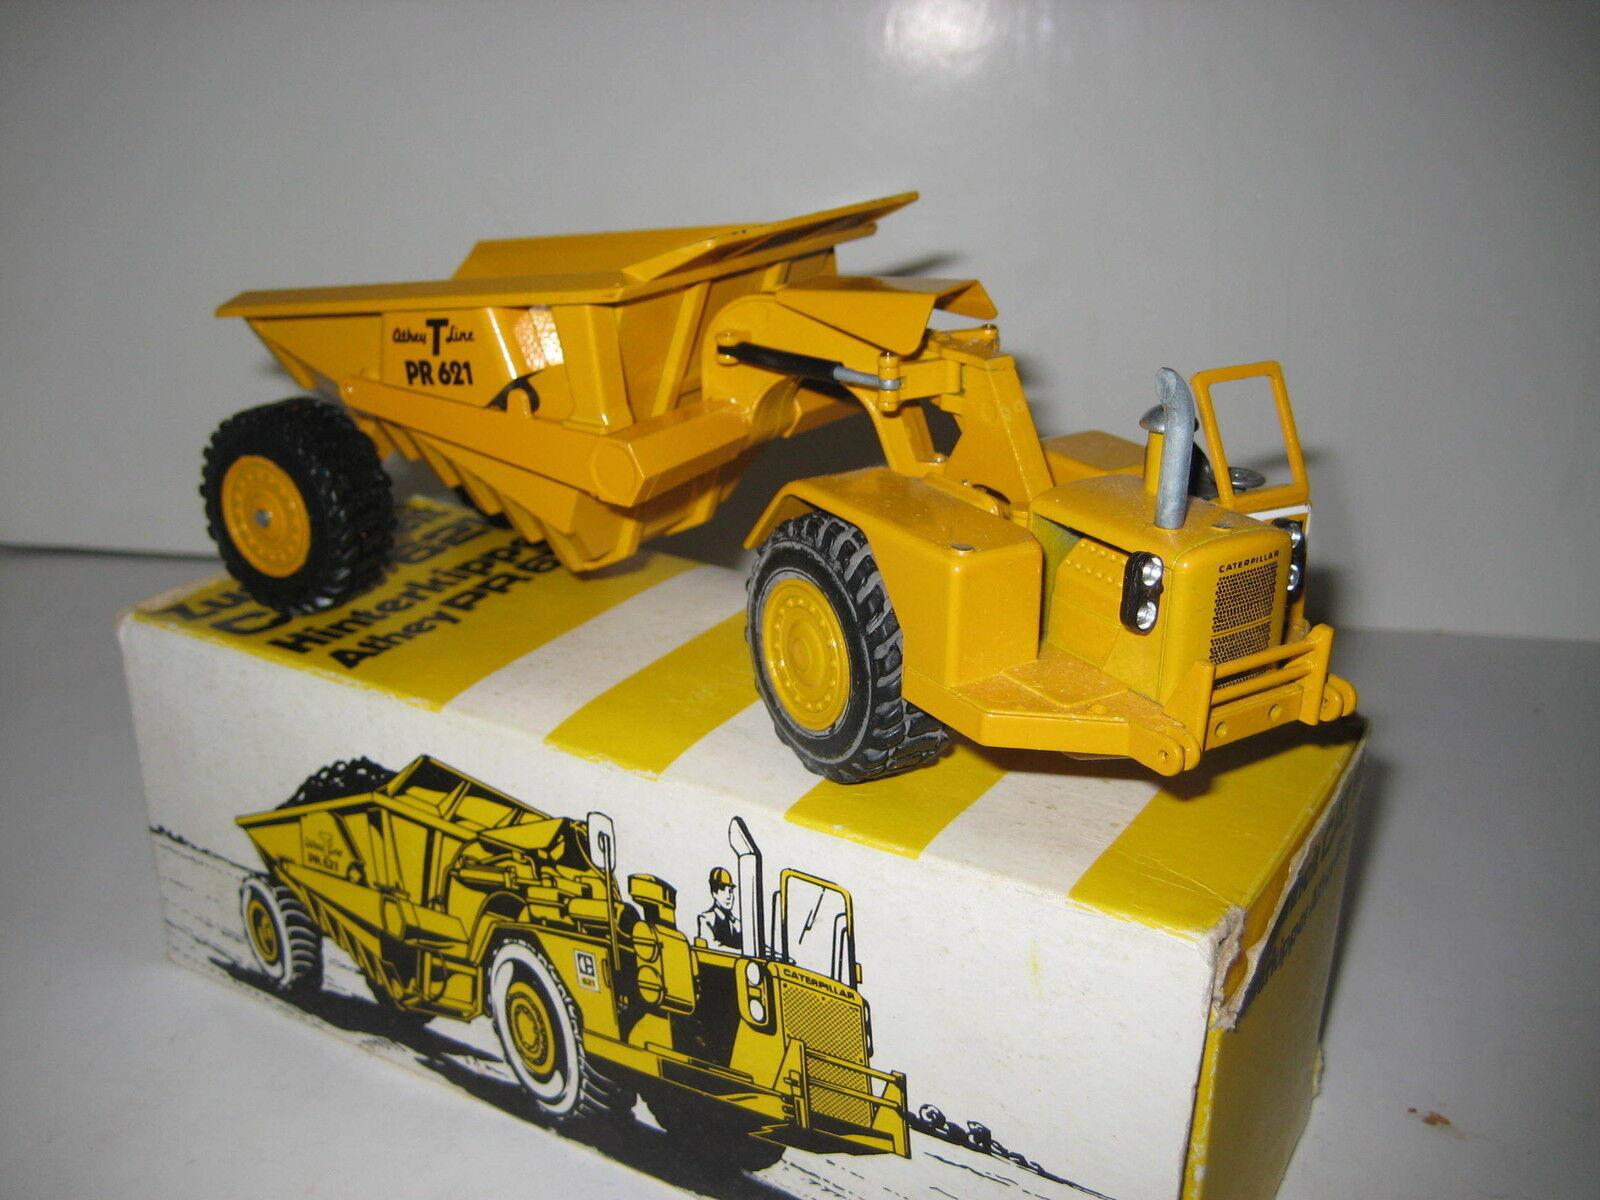 Caterpillar pr 621 tombereaux Athey T Line  132.1 NZG 1 50 neuf dans sa boîte